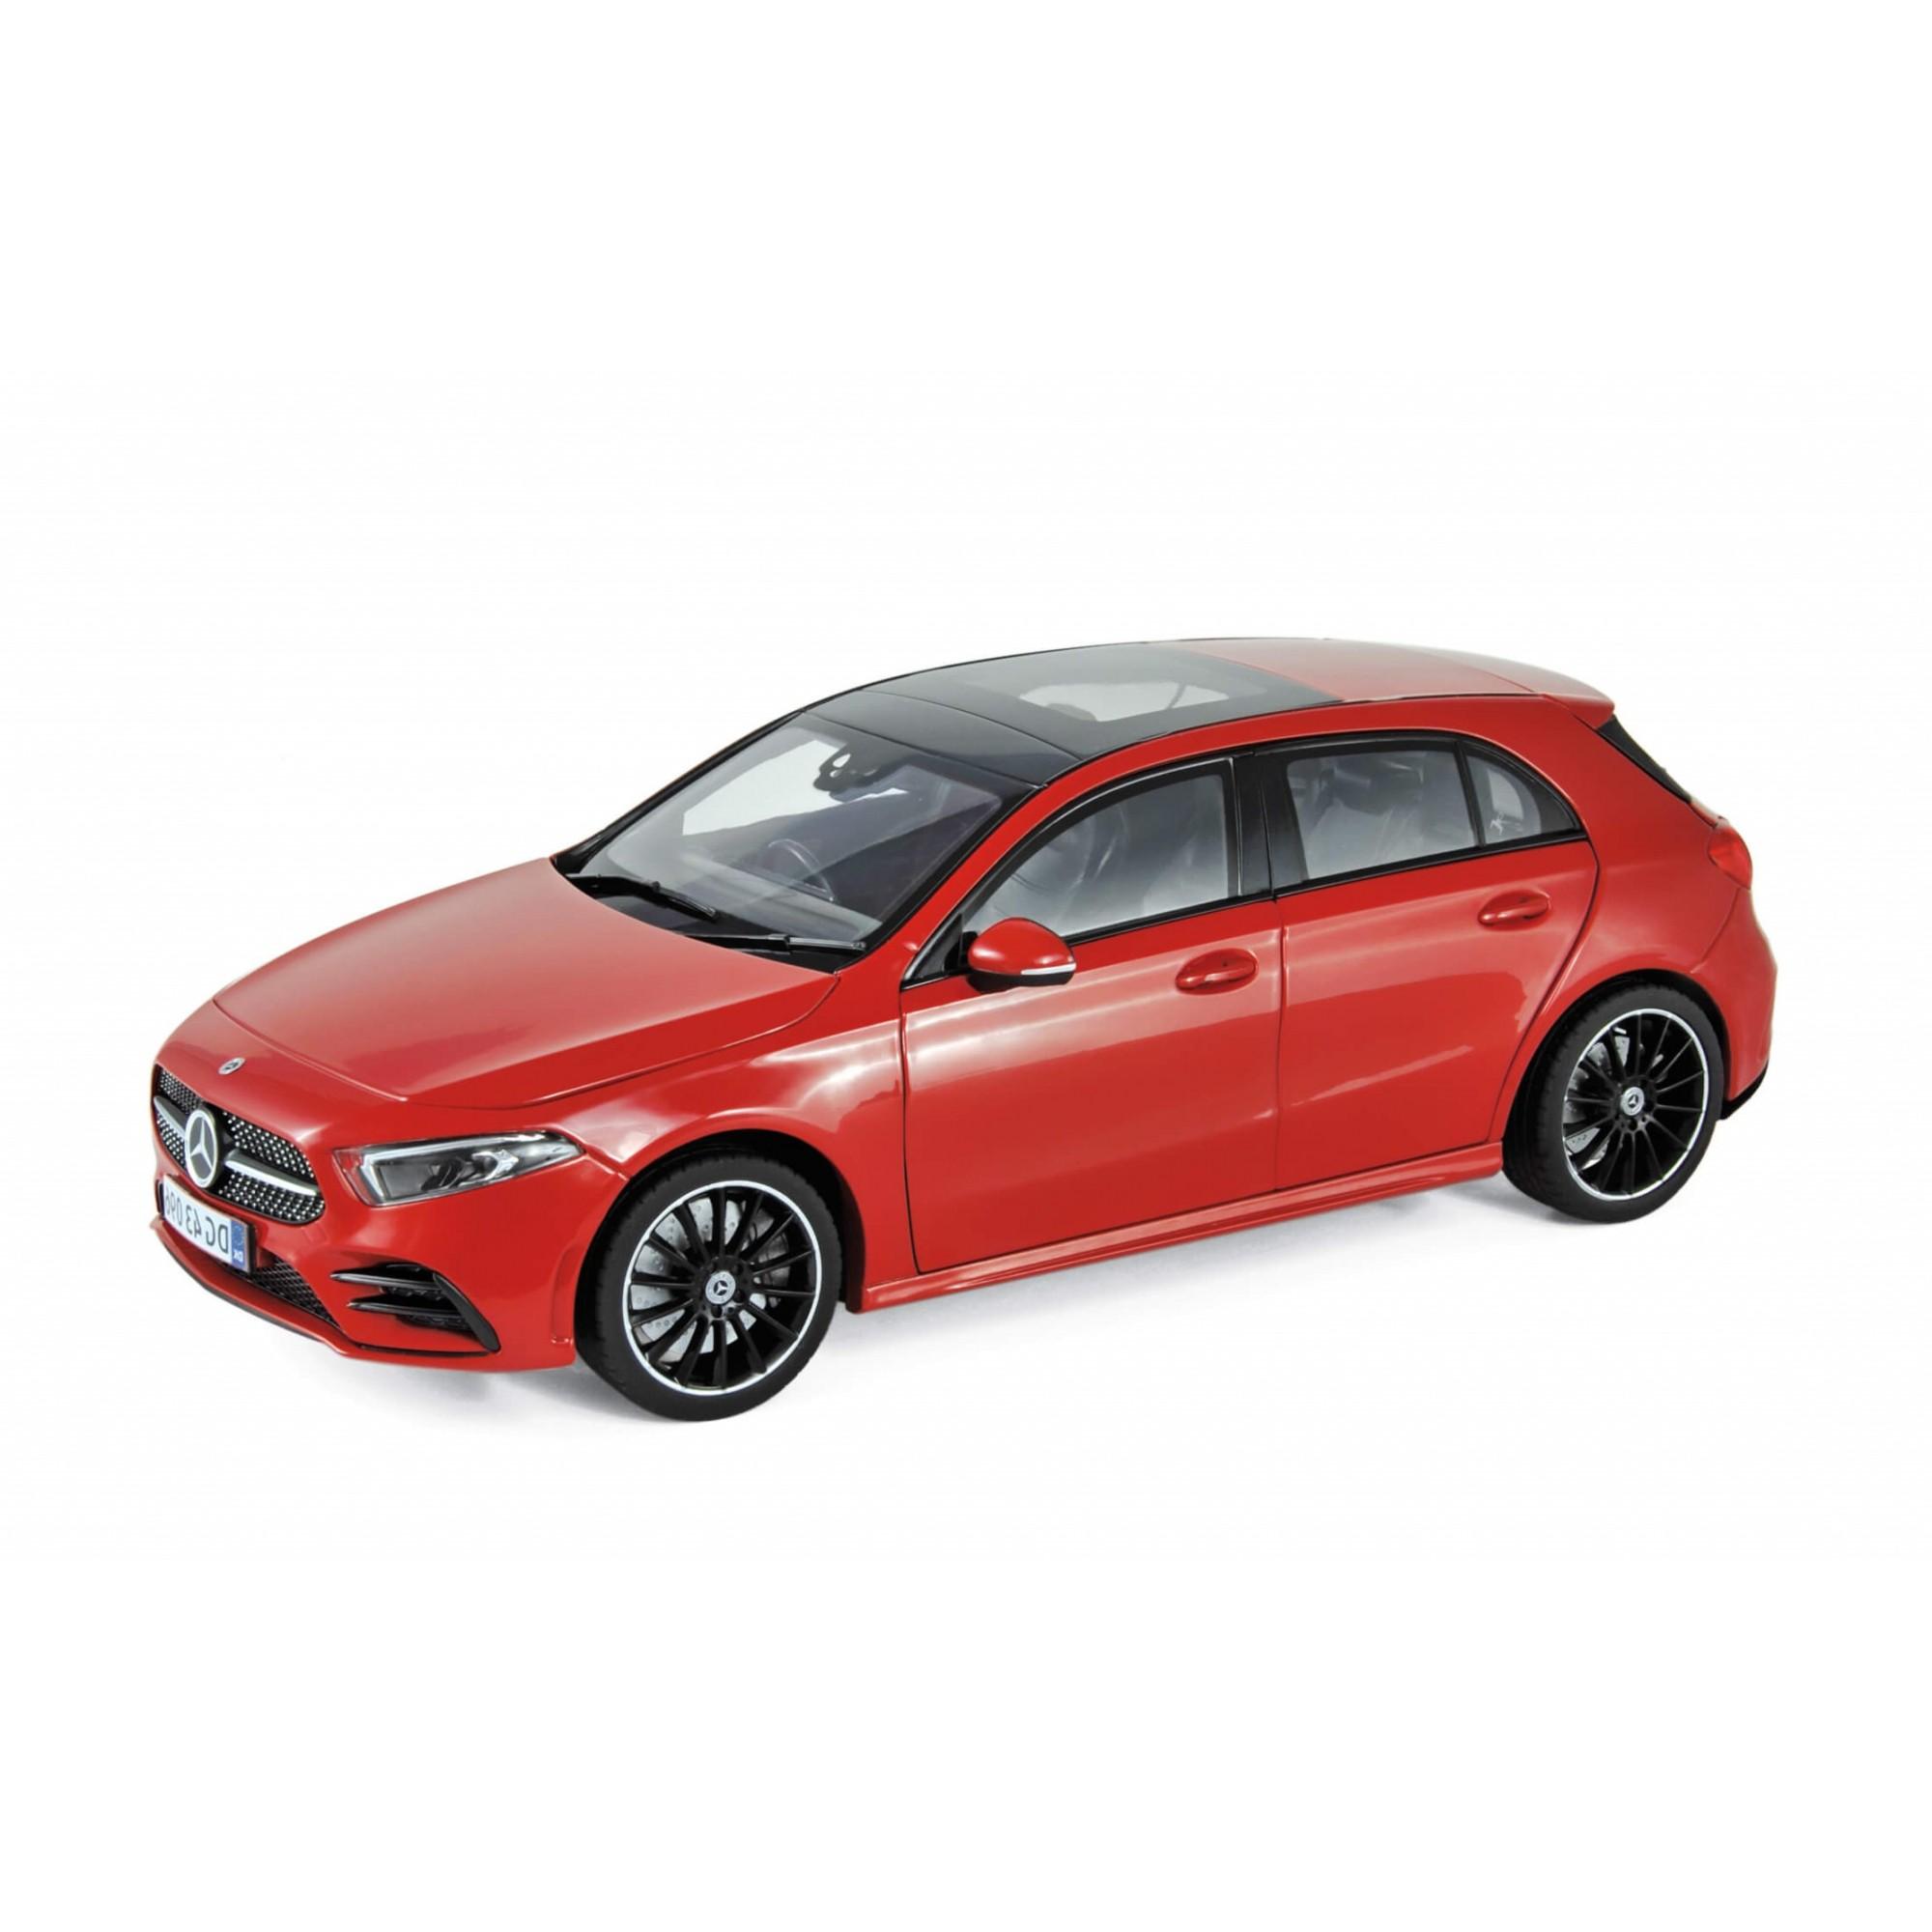 Miniatura Mercedes-Benz A-Class 2018 1/18 Norev